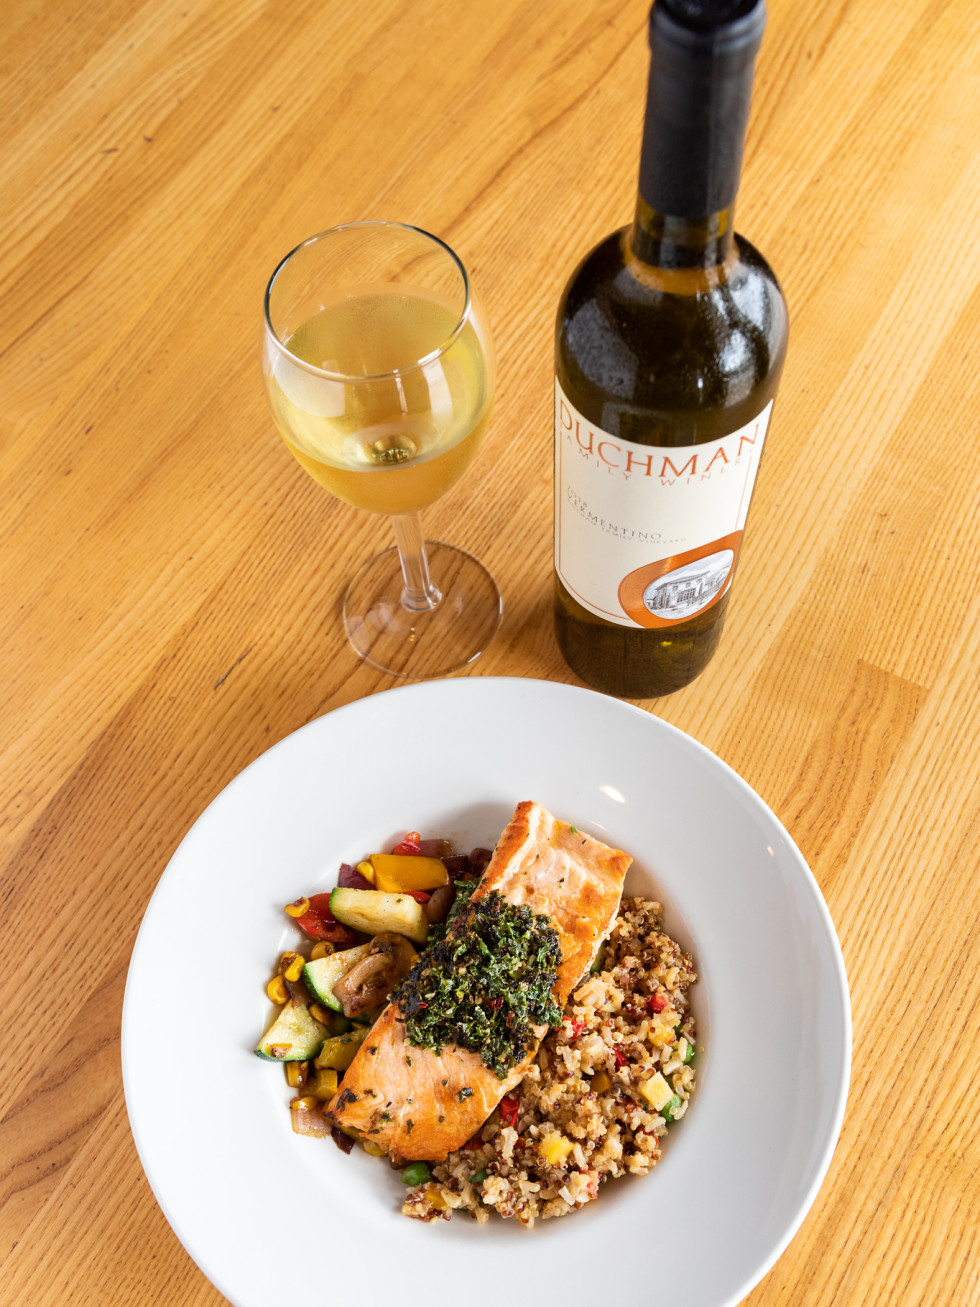 Katz's seafood and wine